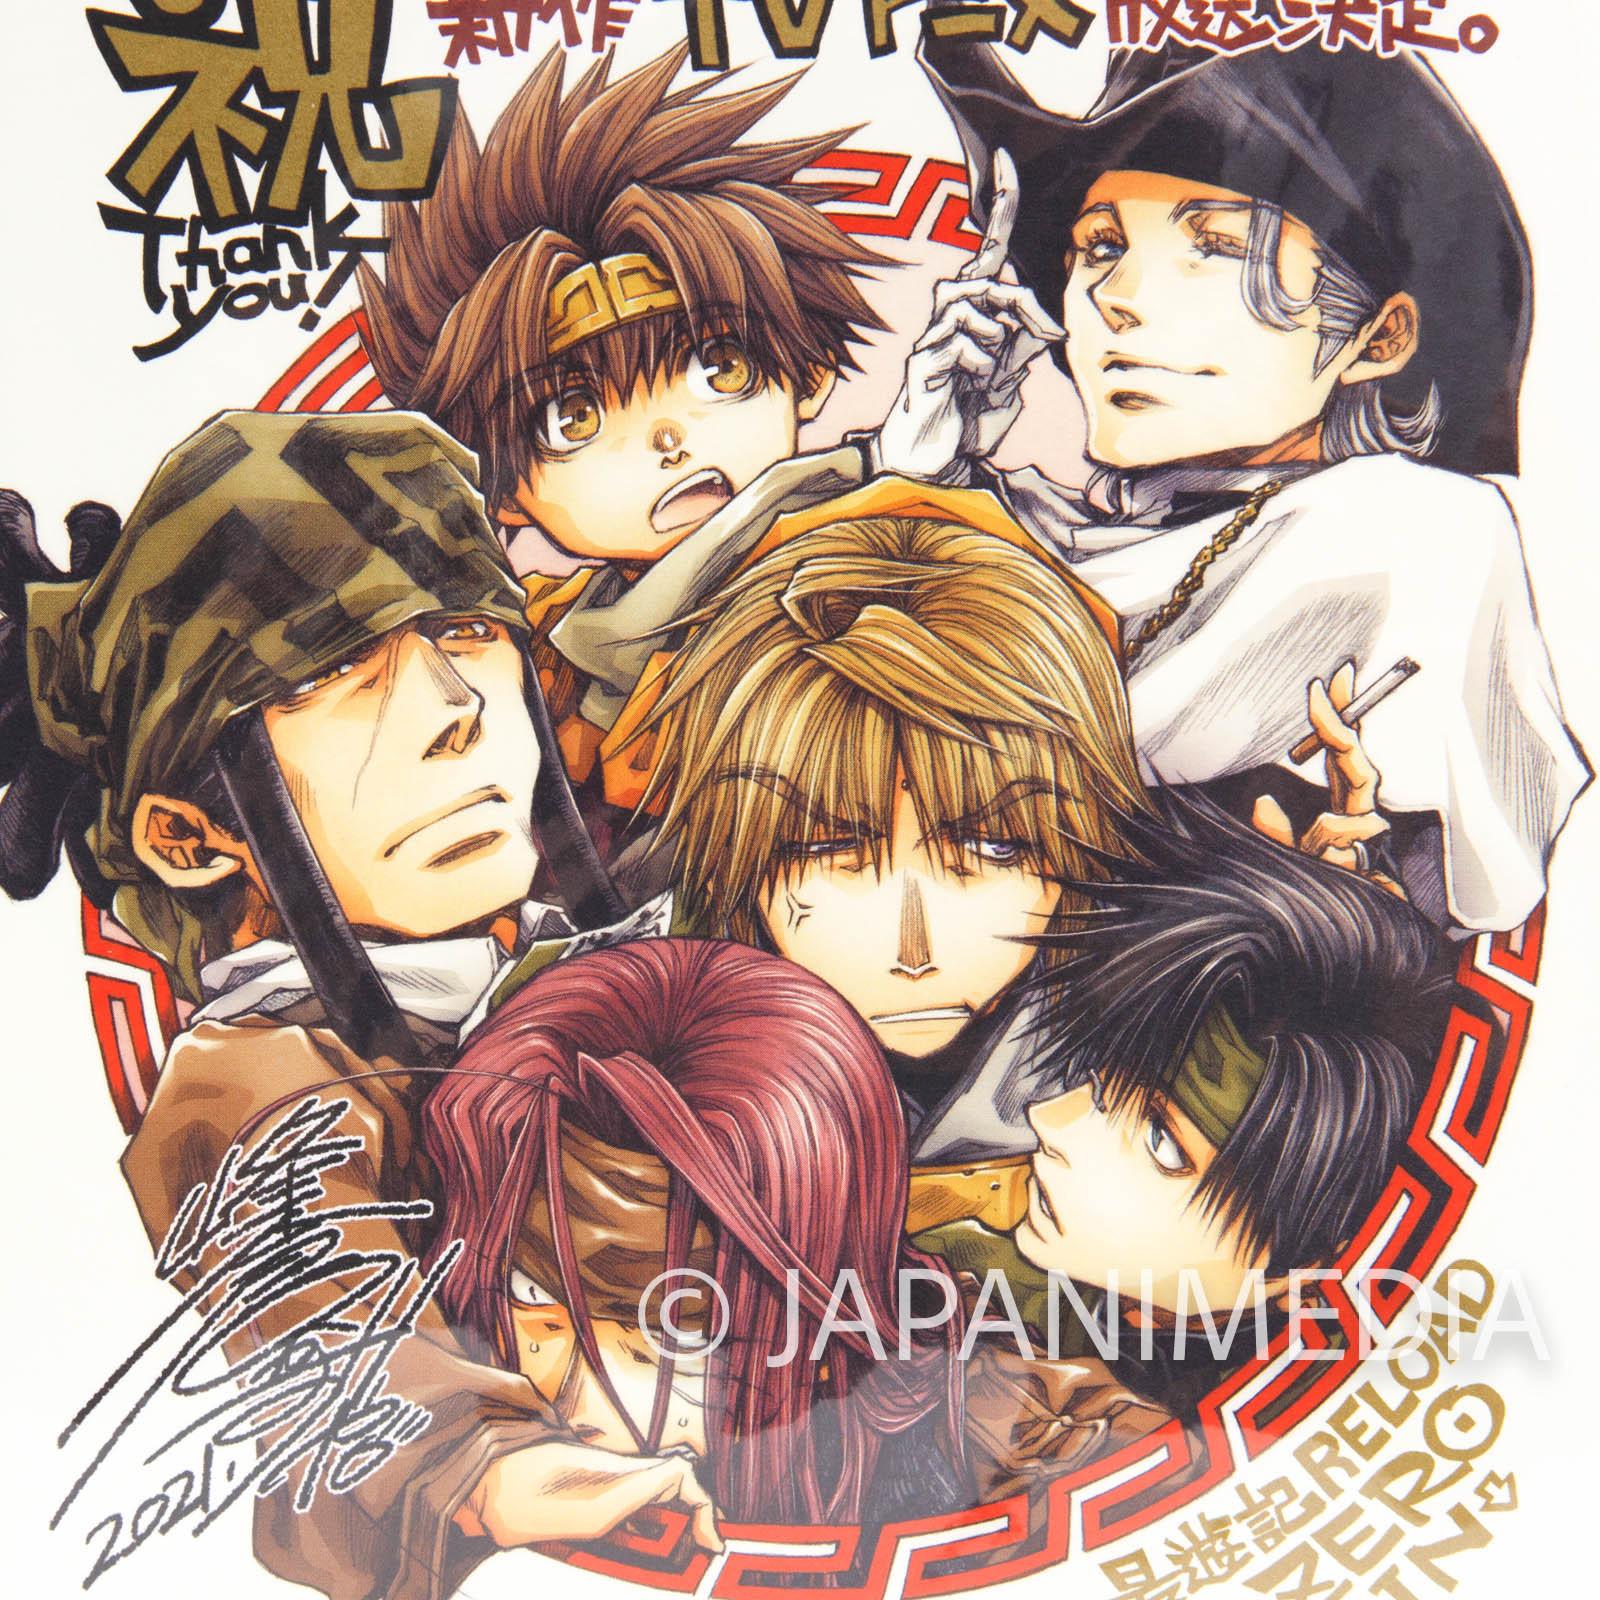 SAIYUKI RELOAD -ZERO IN- Shikishi Mini Illustration board [Sanzo / Goku / Gojyo / Hakkai] JAPAN MANGA